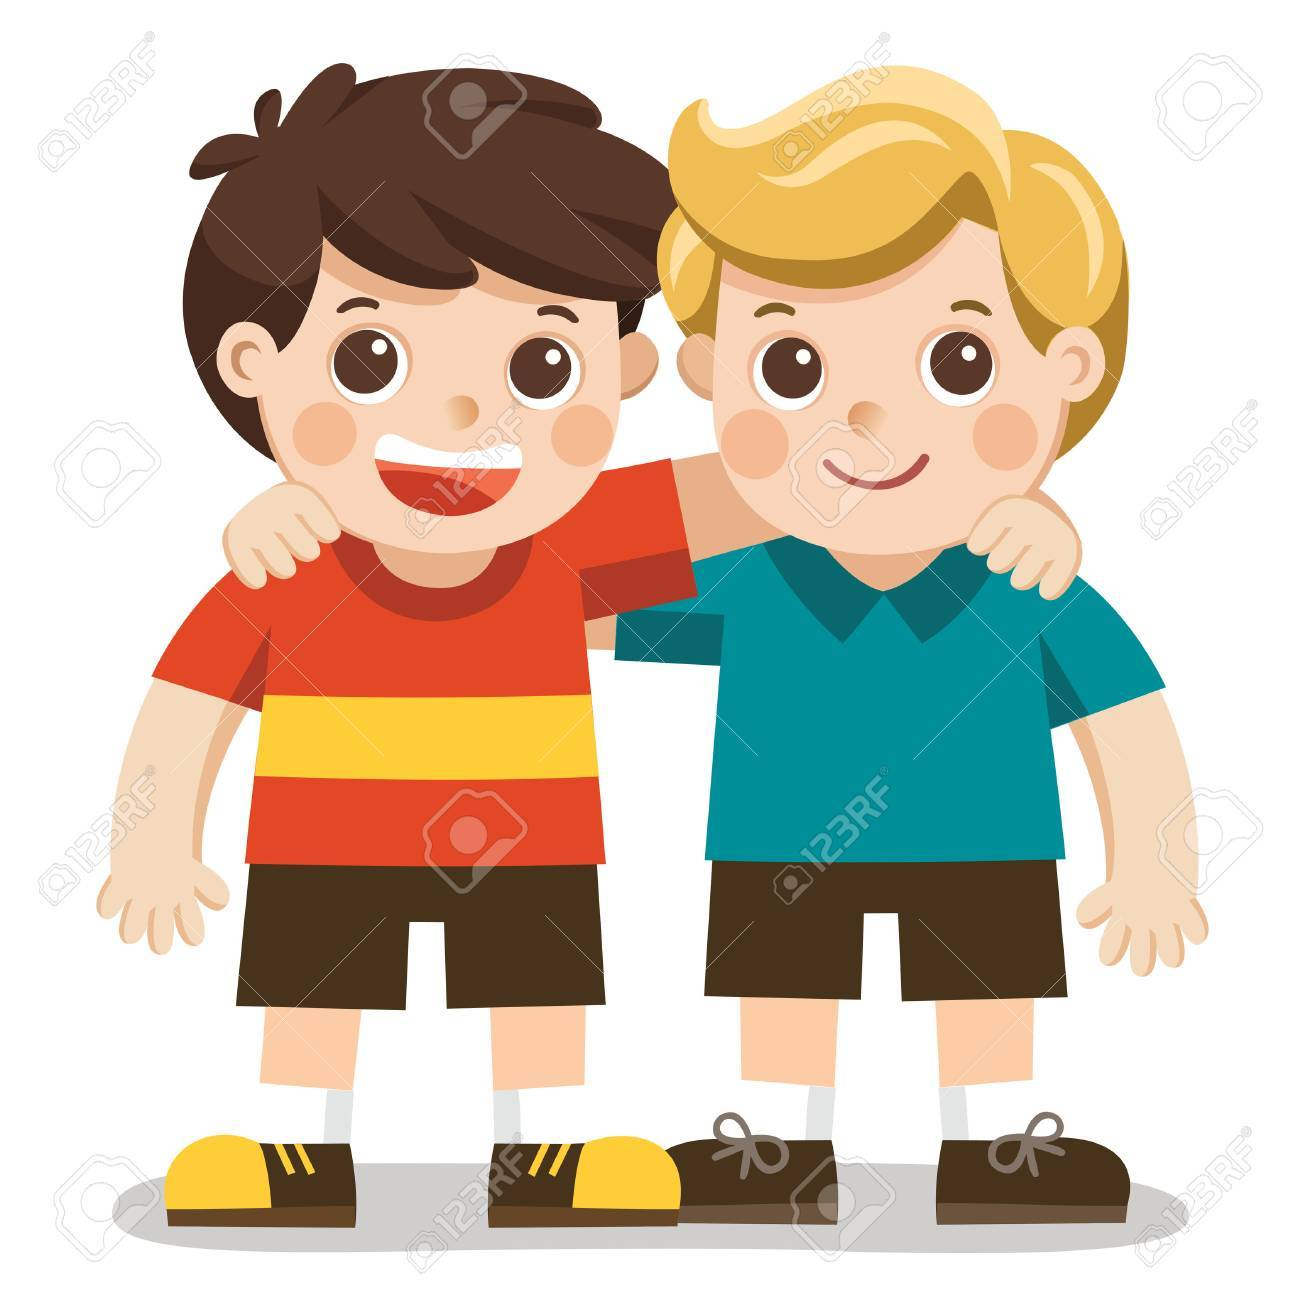 Best friends clipart boys 2 » Clipart Portal.